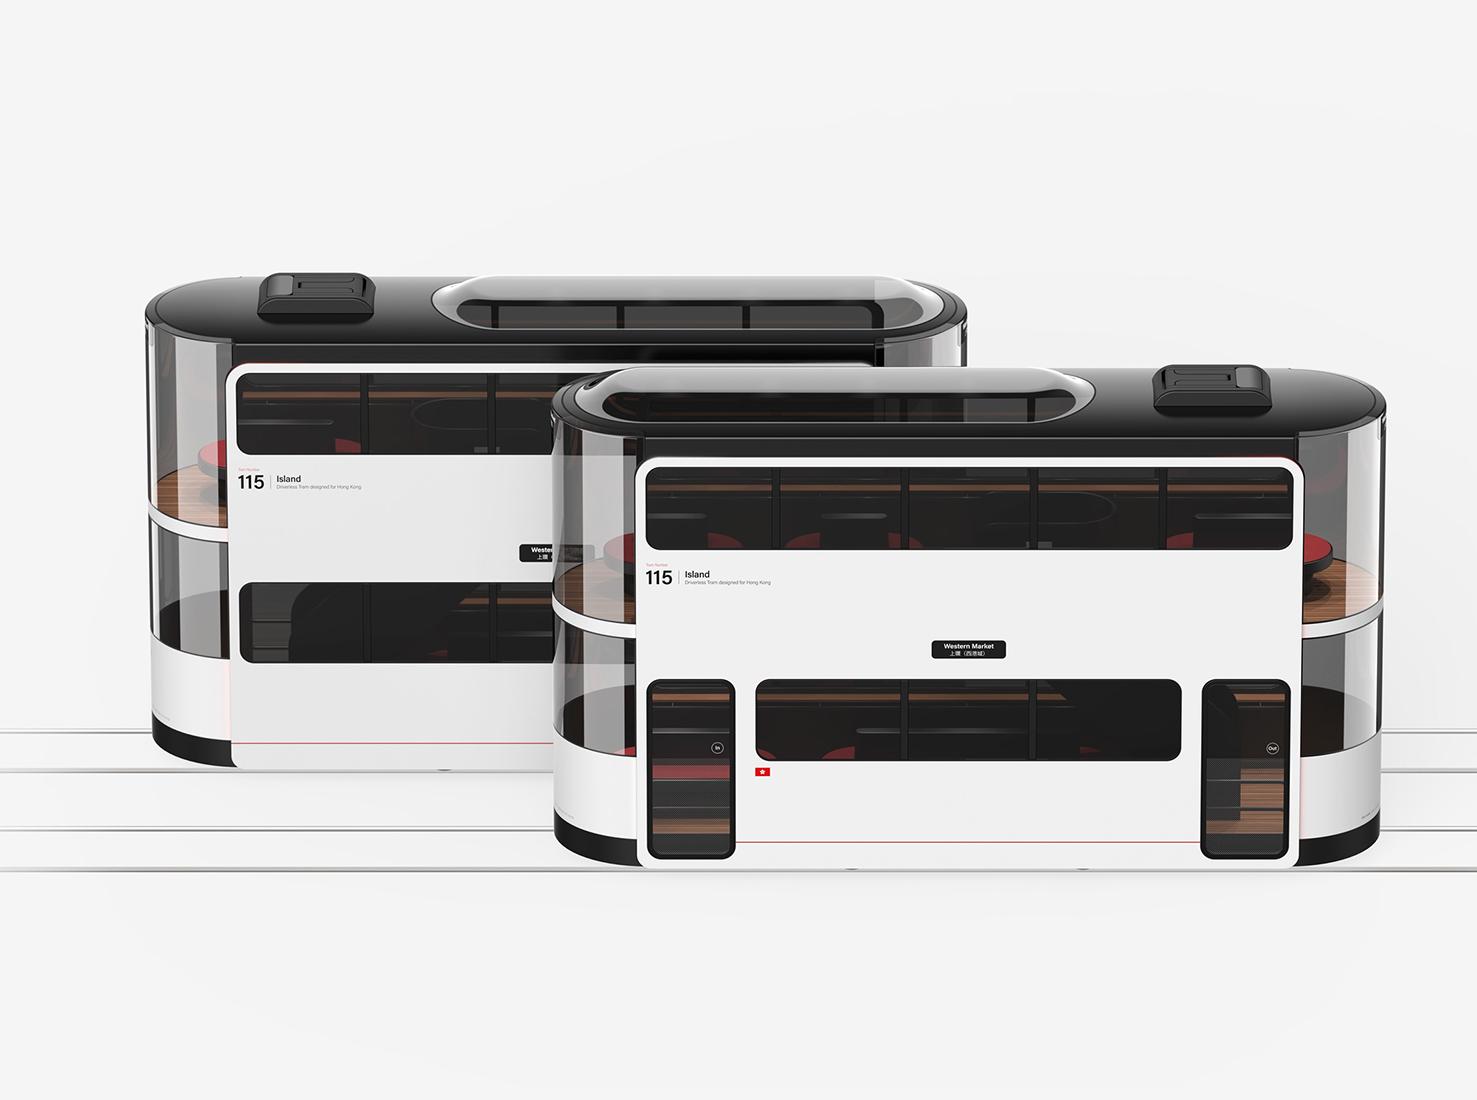 Двухэтажный трамвай фото